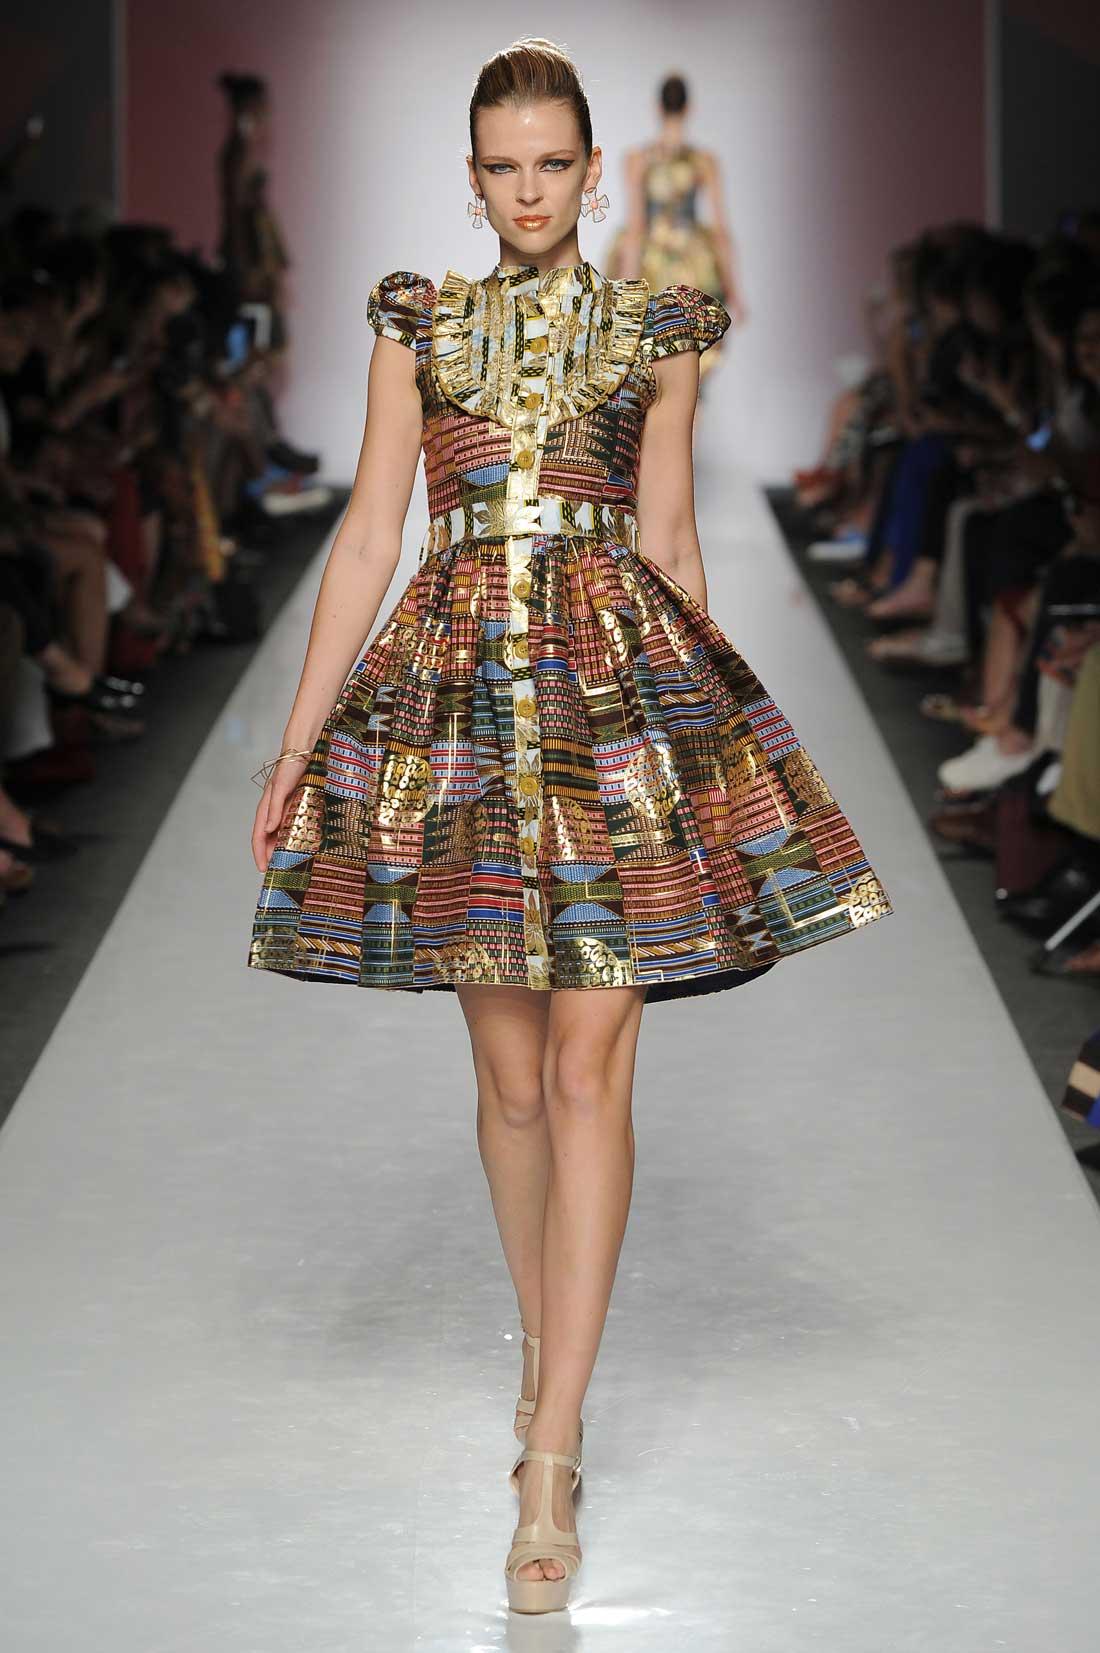 Ethical Fashion Initiative